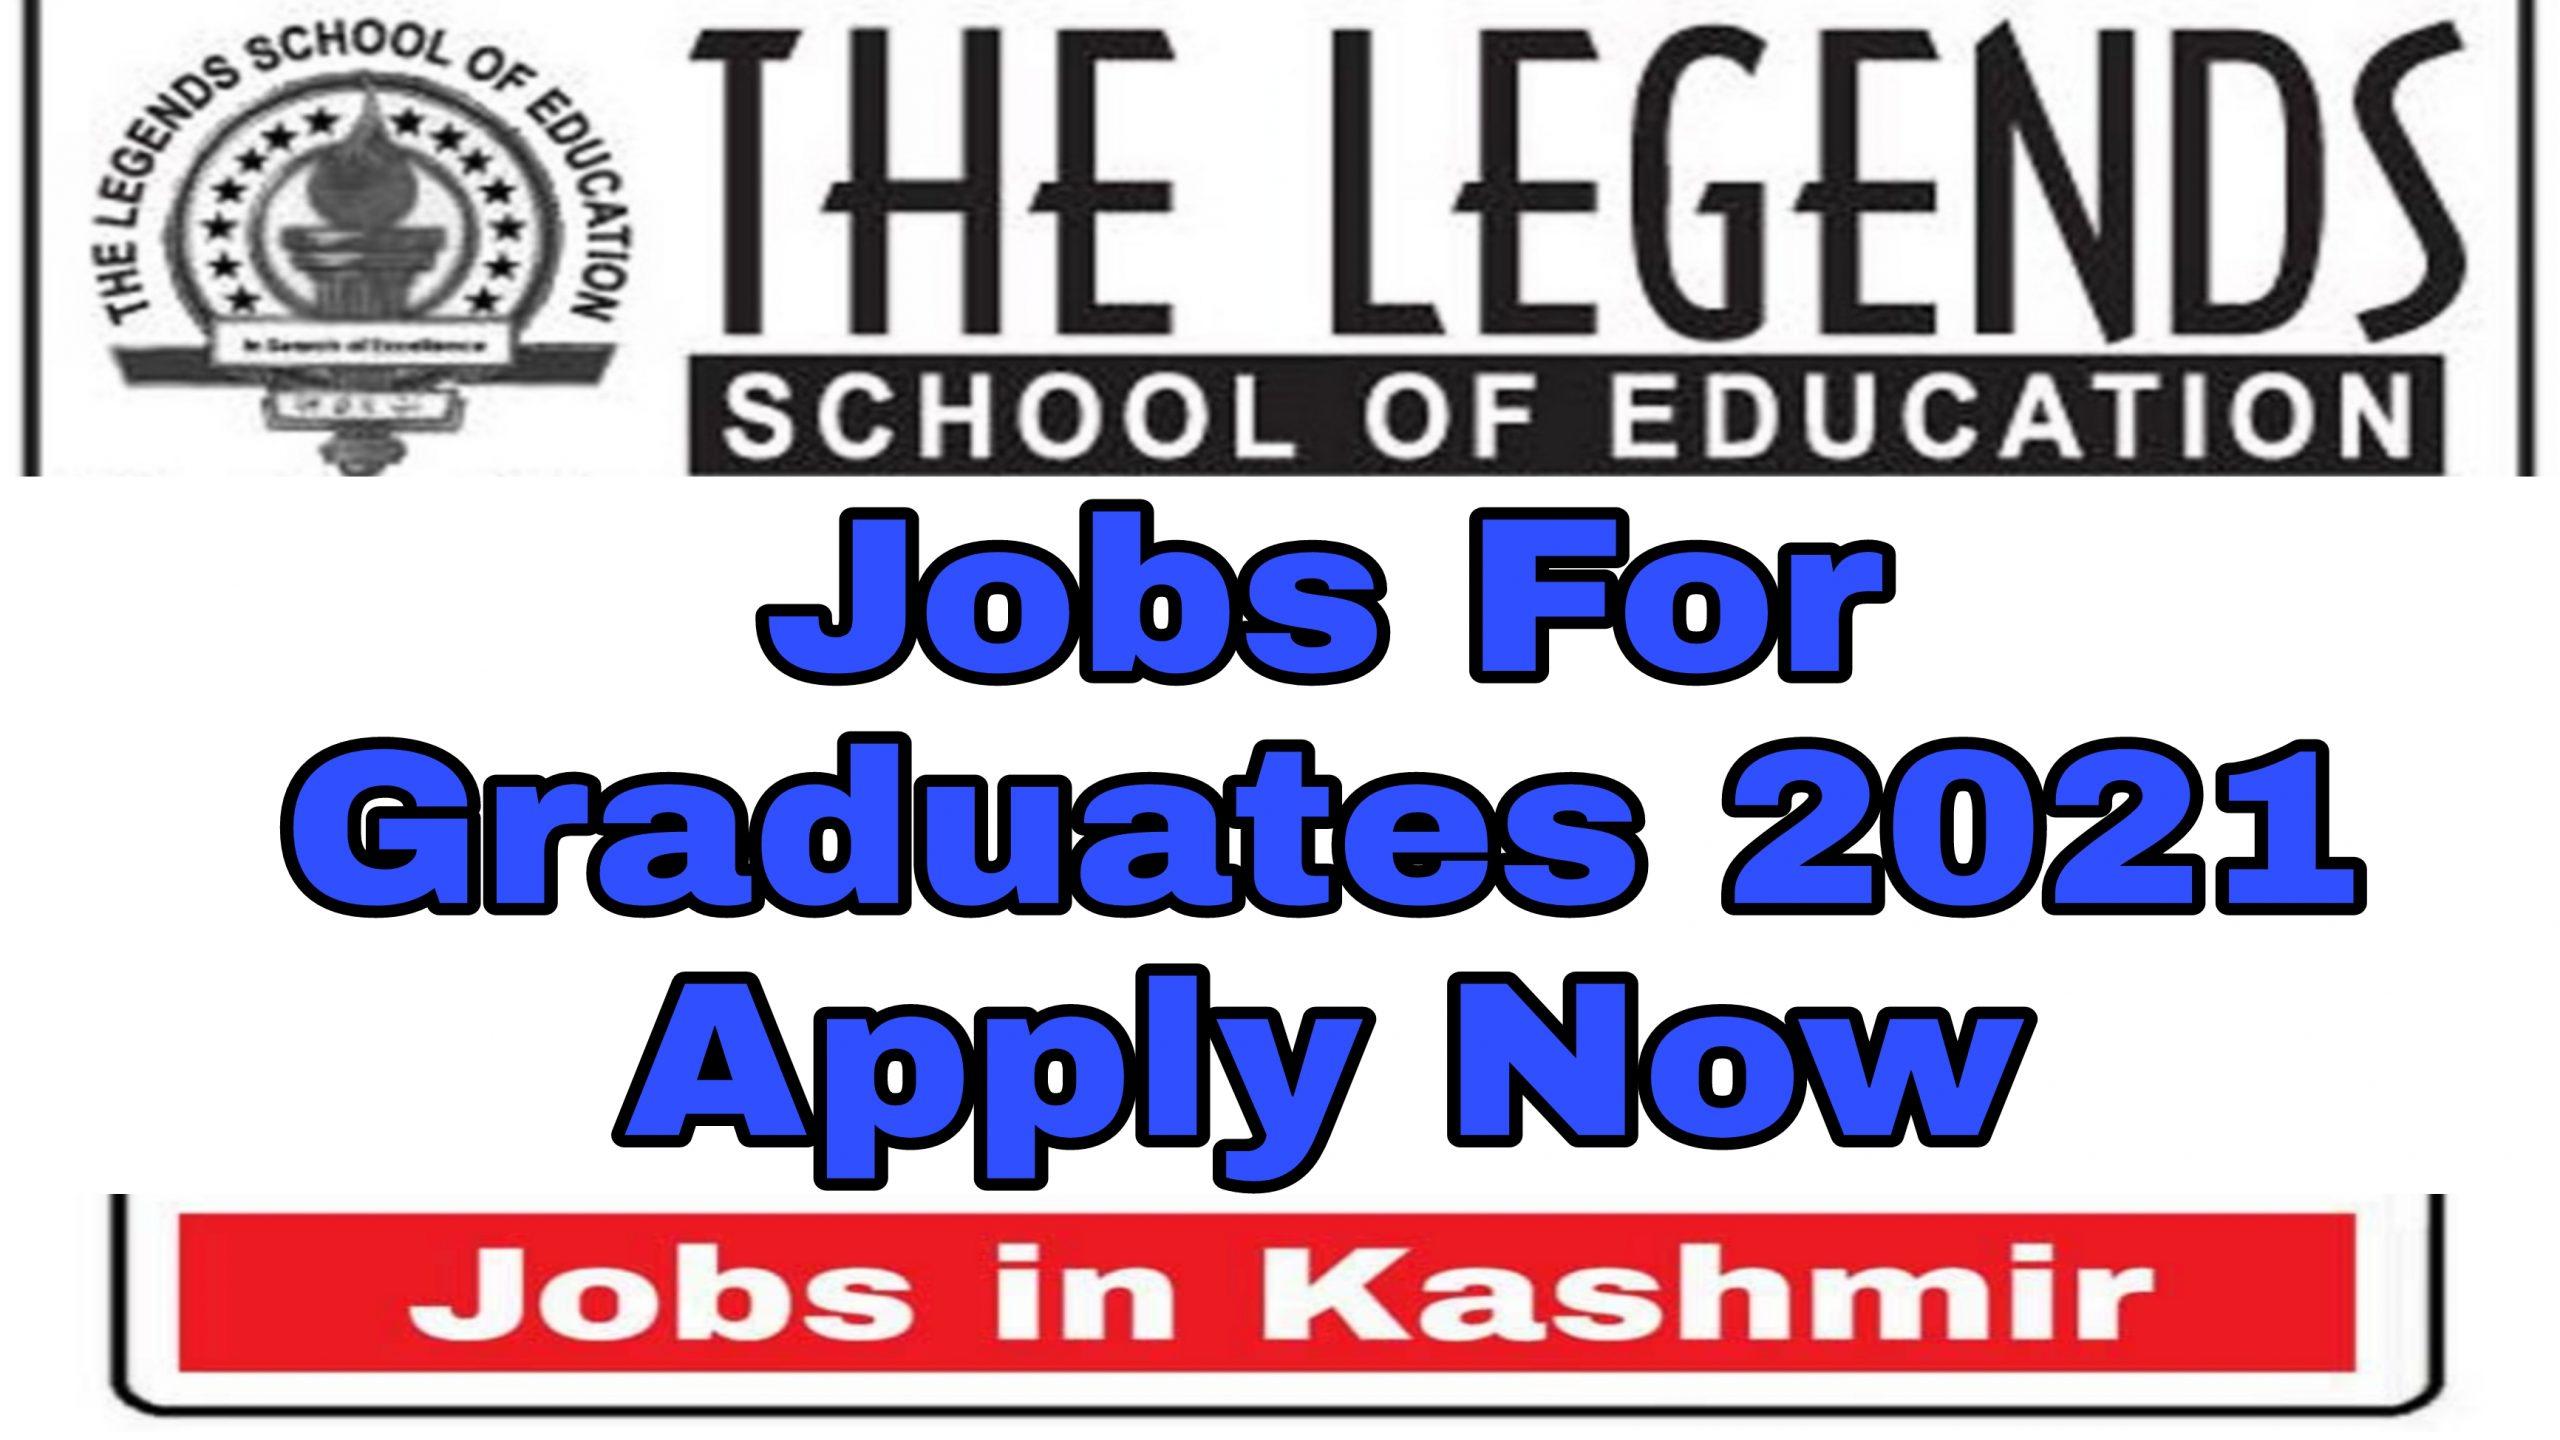 legends school of education kanitar Hazratbal Admission fee structure Jobs 2021 Srinagar Contact number